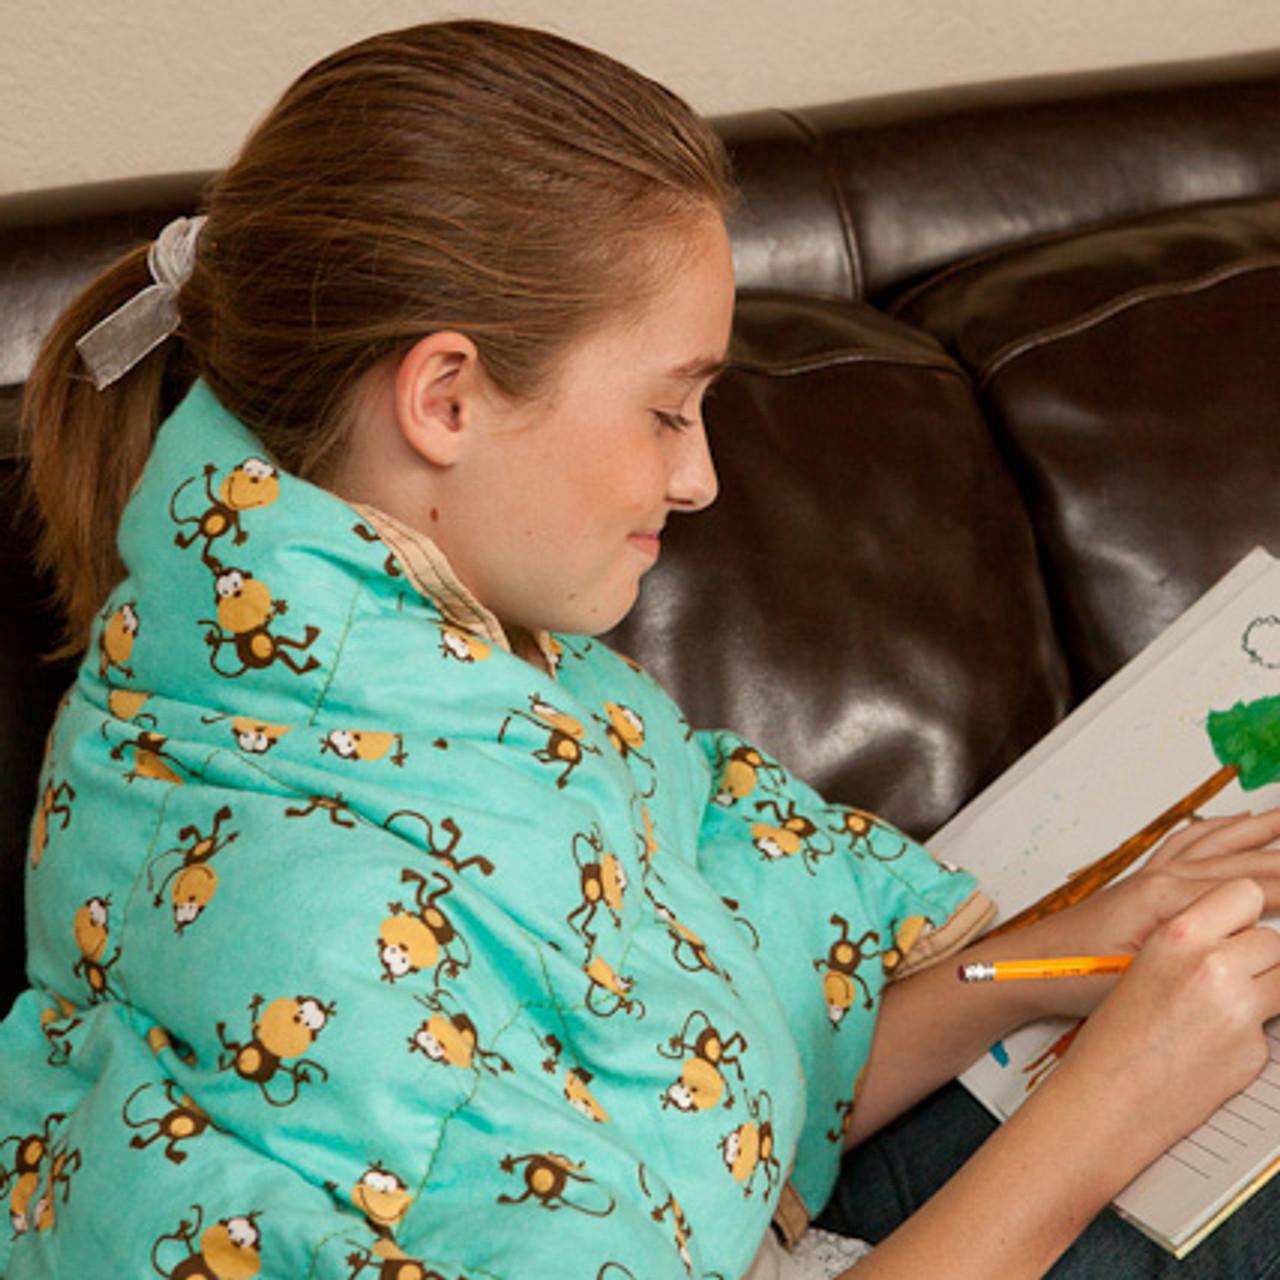 Weighted Sensory And Autism Sleep Blankets Teen Girls